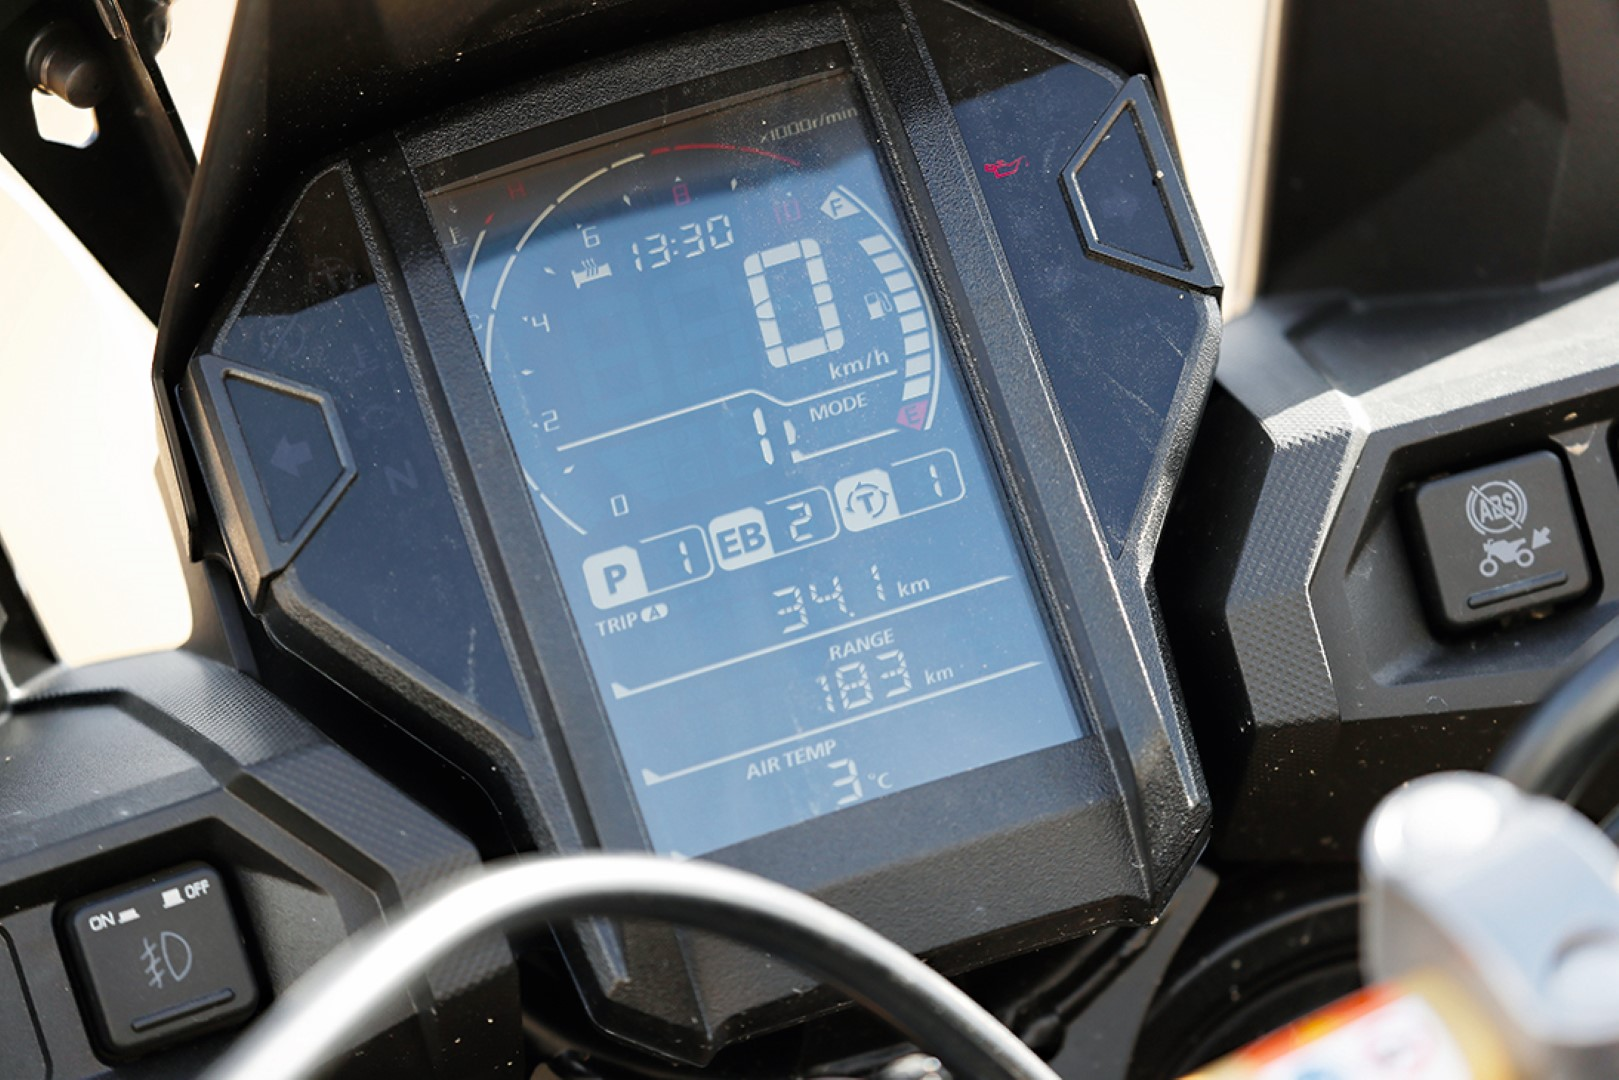 Comparativa trail: BMW F 850 GS, Honda CRF1000L África Twin, KTM 790 Adventure R, Triumph Tiger 800 XCA. Yamaha Ténéré 700